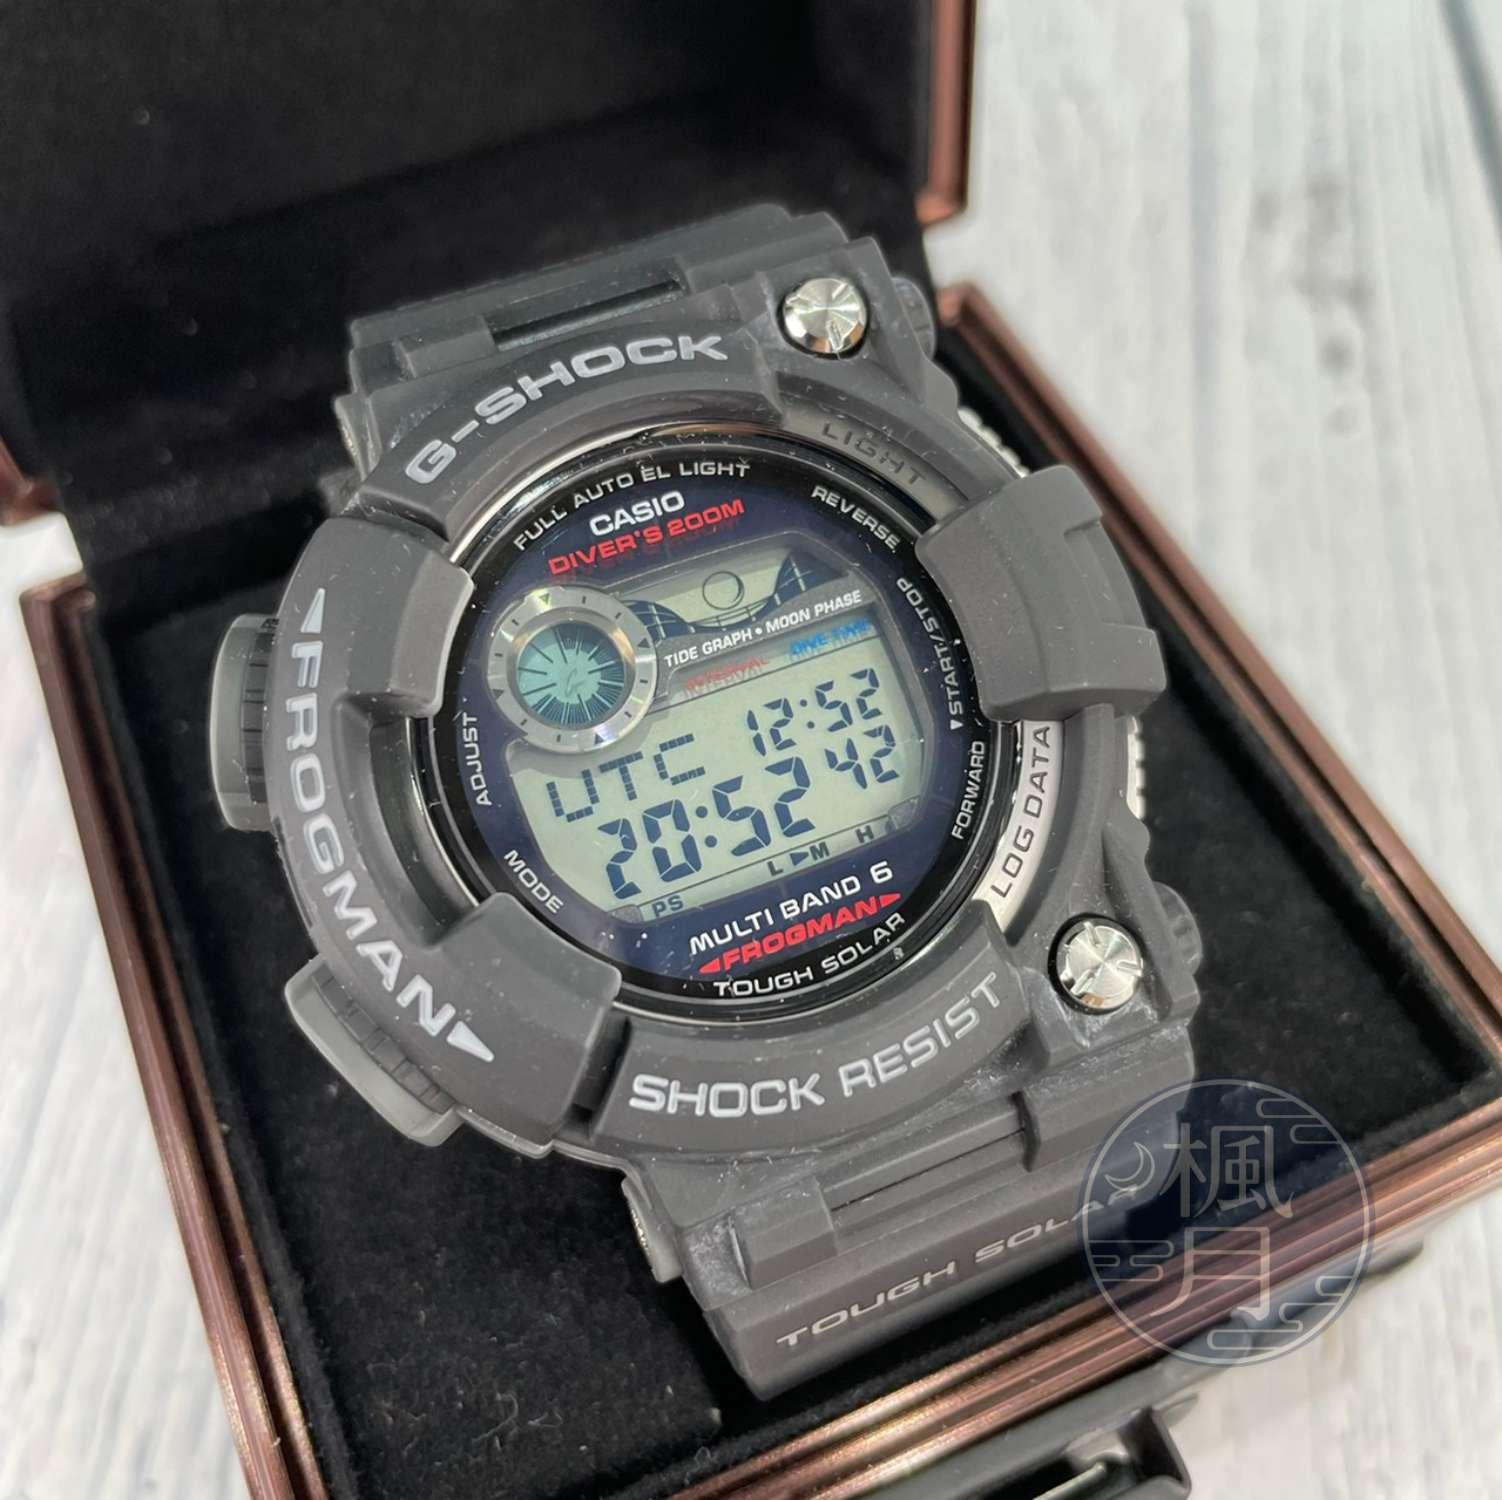 BRAND楓月 CASIO 卡西歐 G-SHOCK GWF-1000 黑色橡膠表帶 光動能 數字錶 電子錶